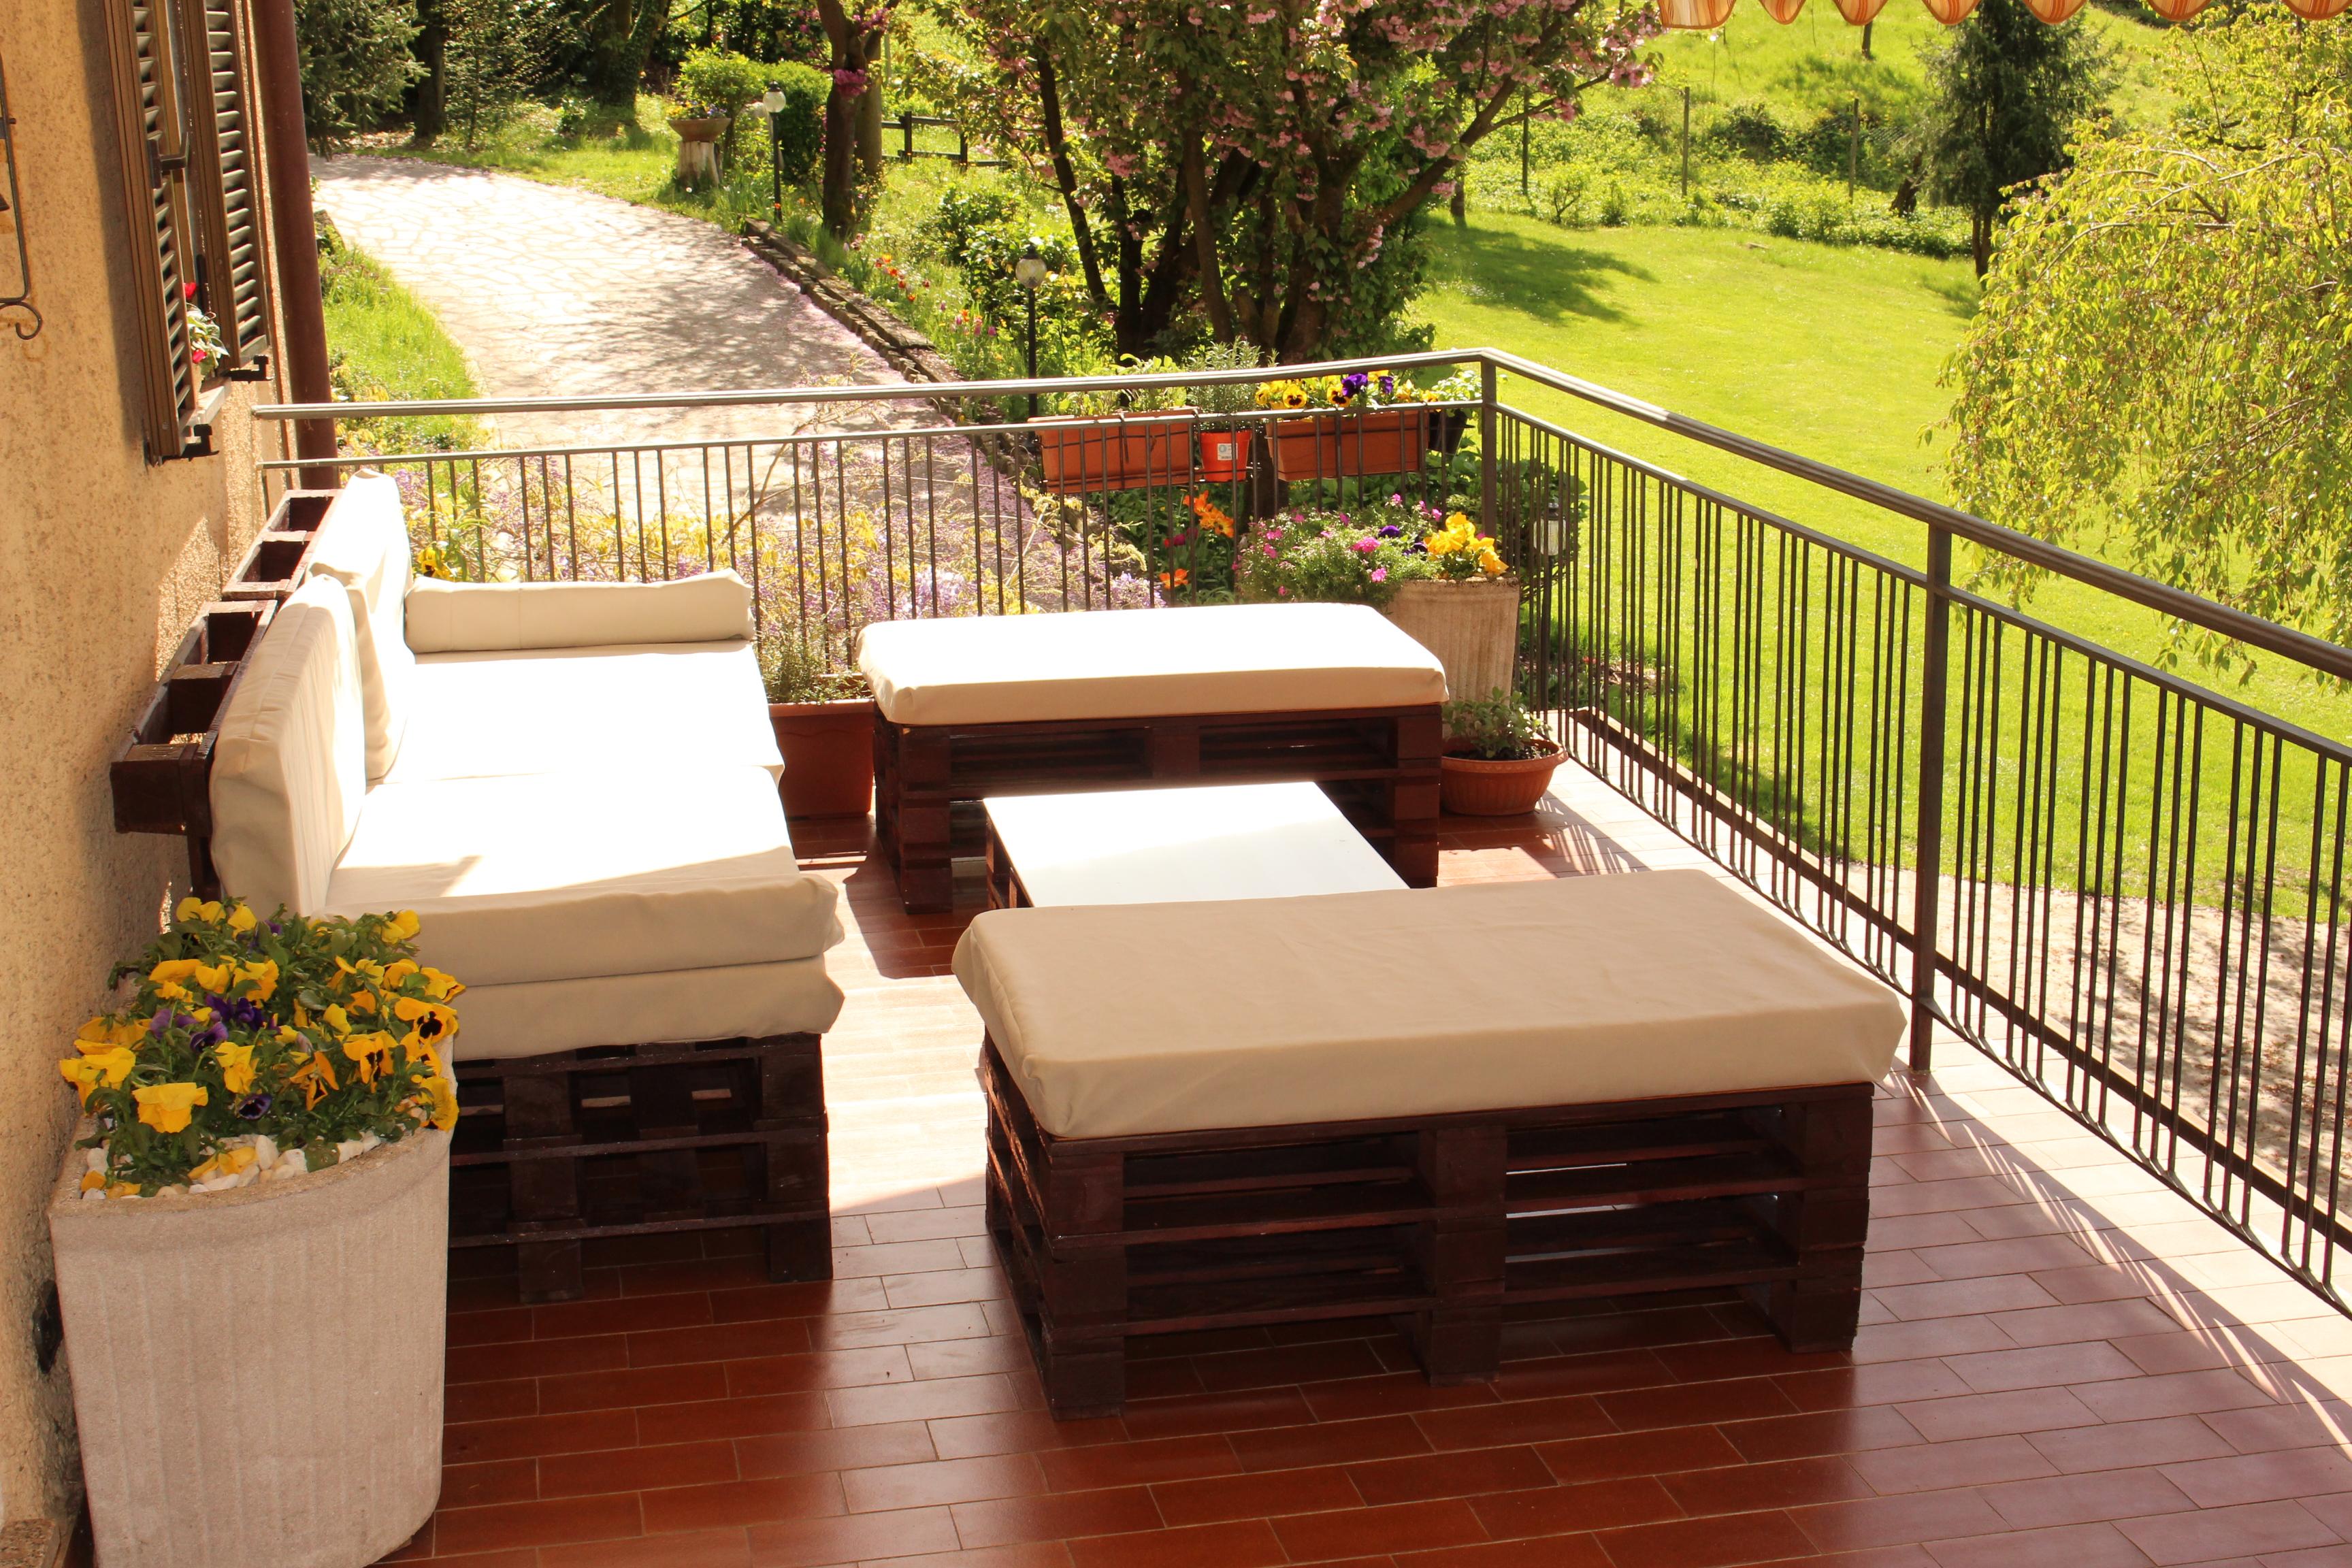 Mobili Da Giardino Con Pallet arredamento da giardino in pallet | gr design